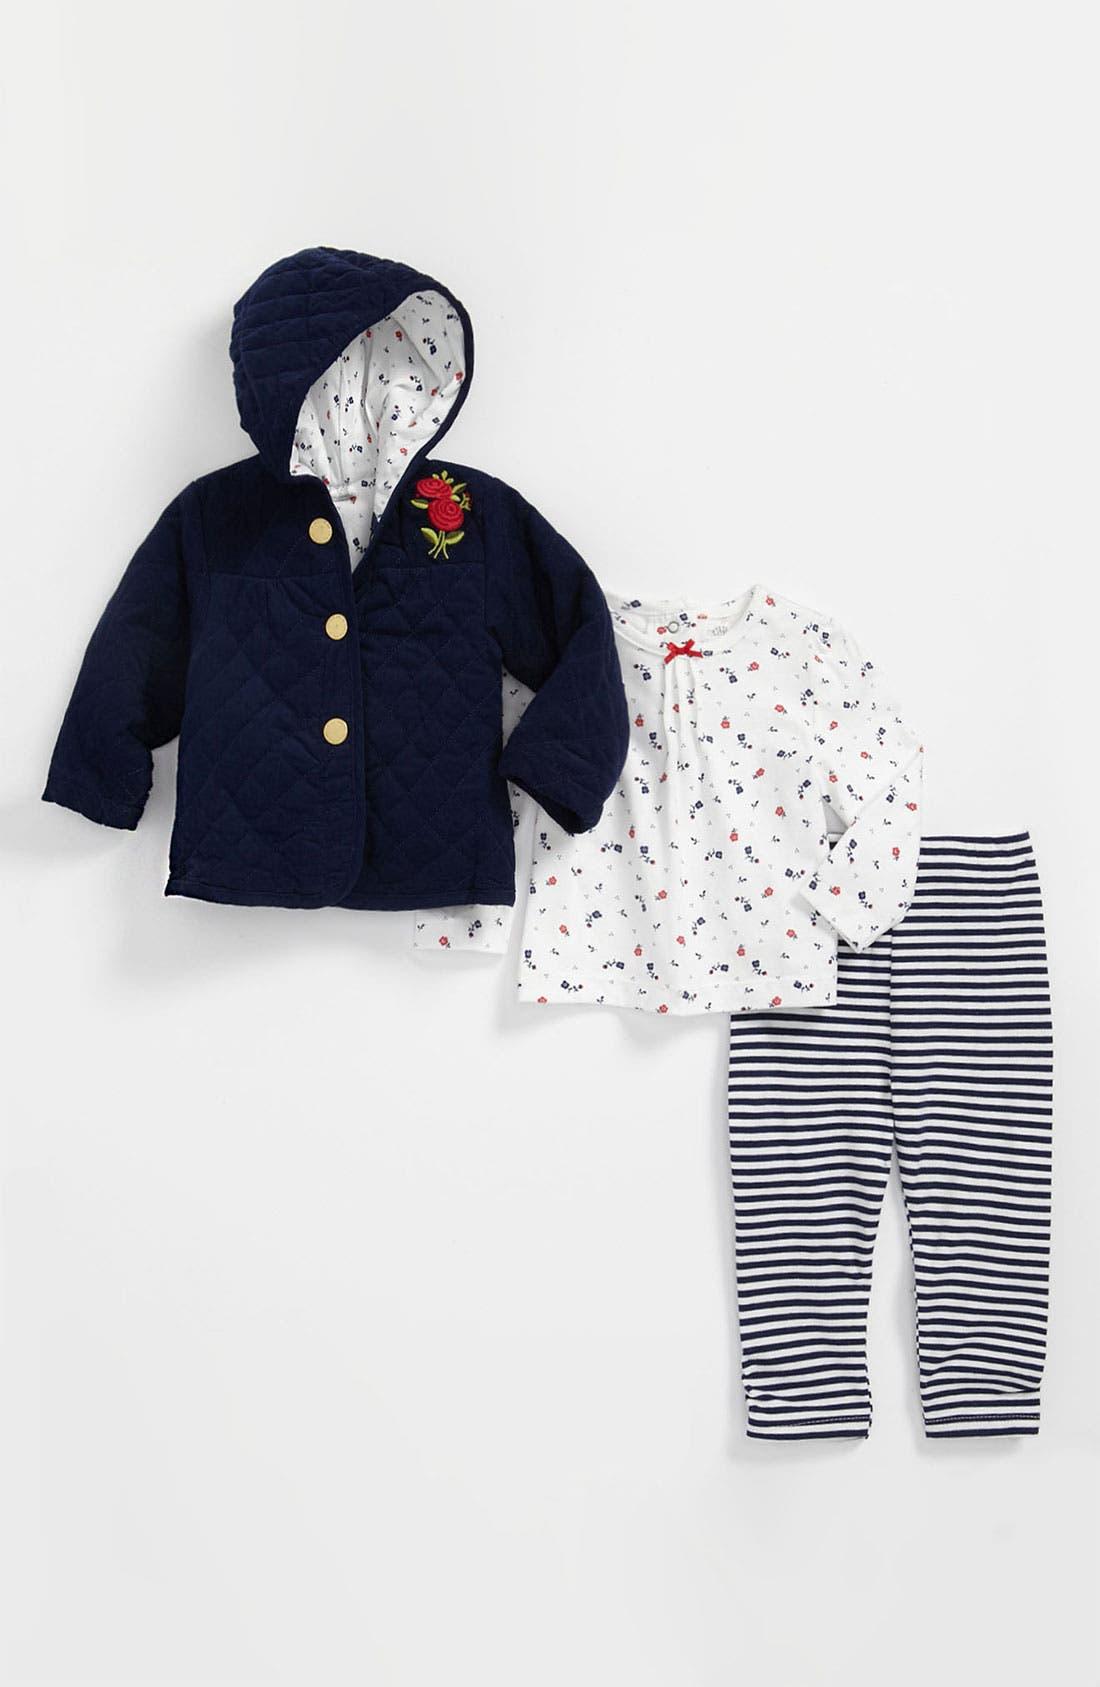 Main Image - Little Me 'Navy Rose' Top, Leggings & Jacket (Infant)